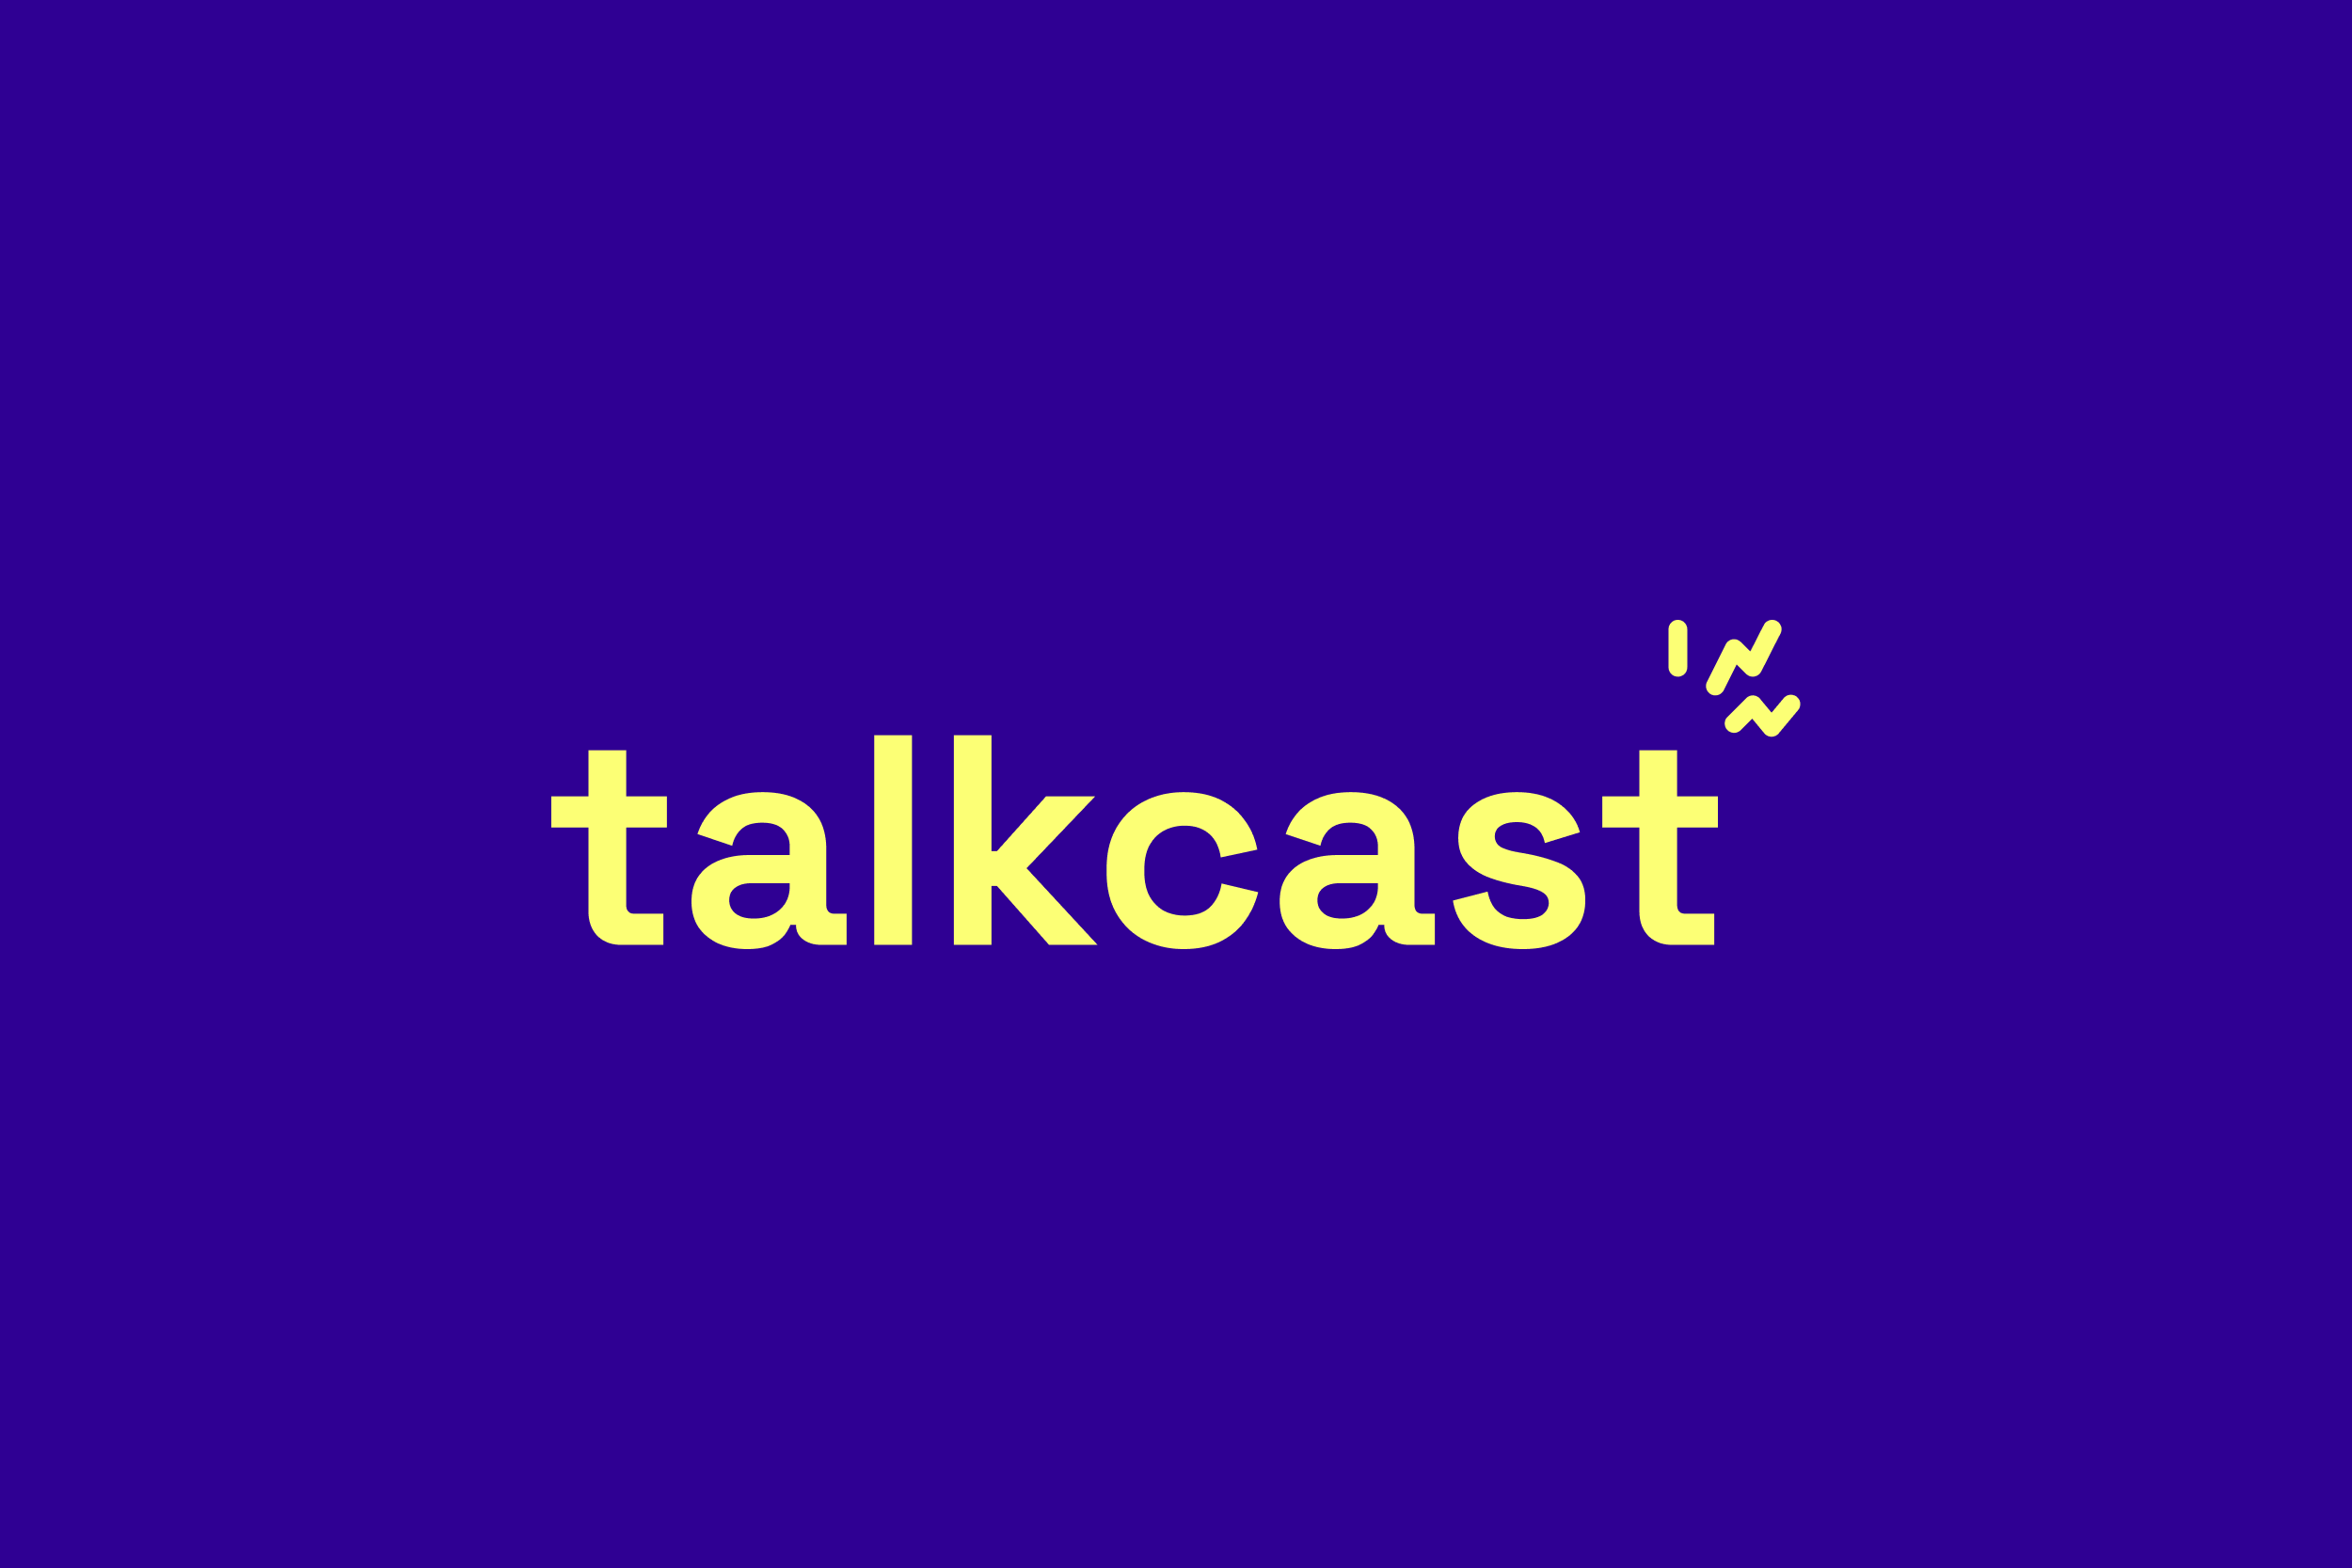 Talkcast